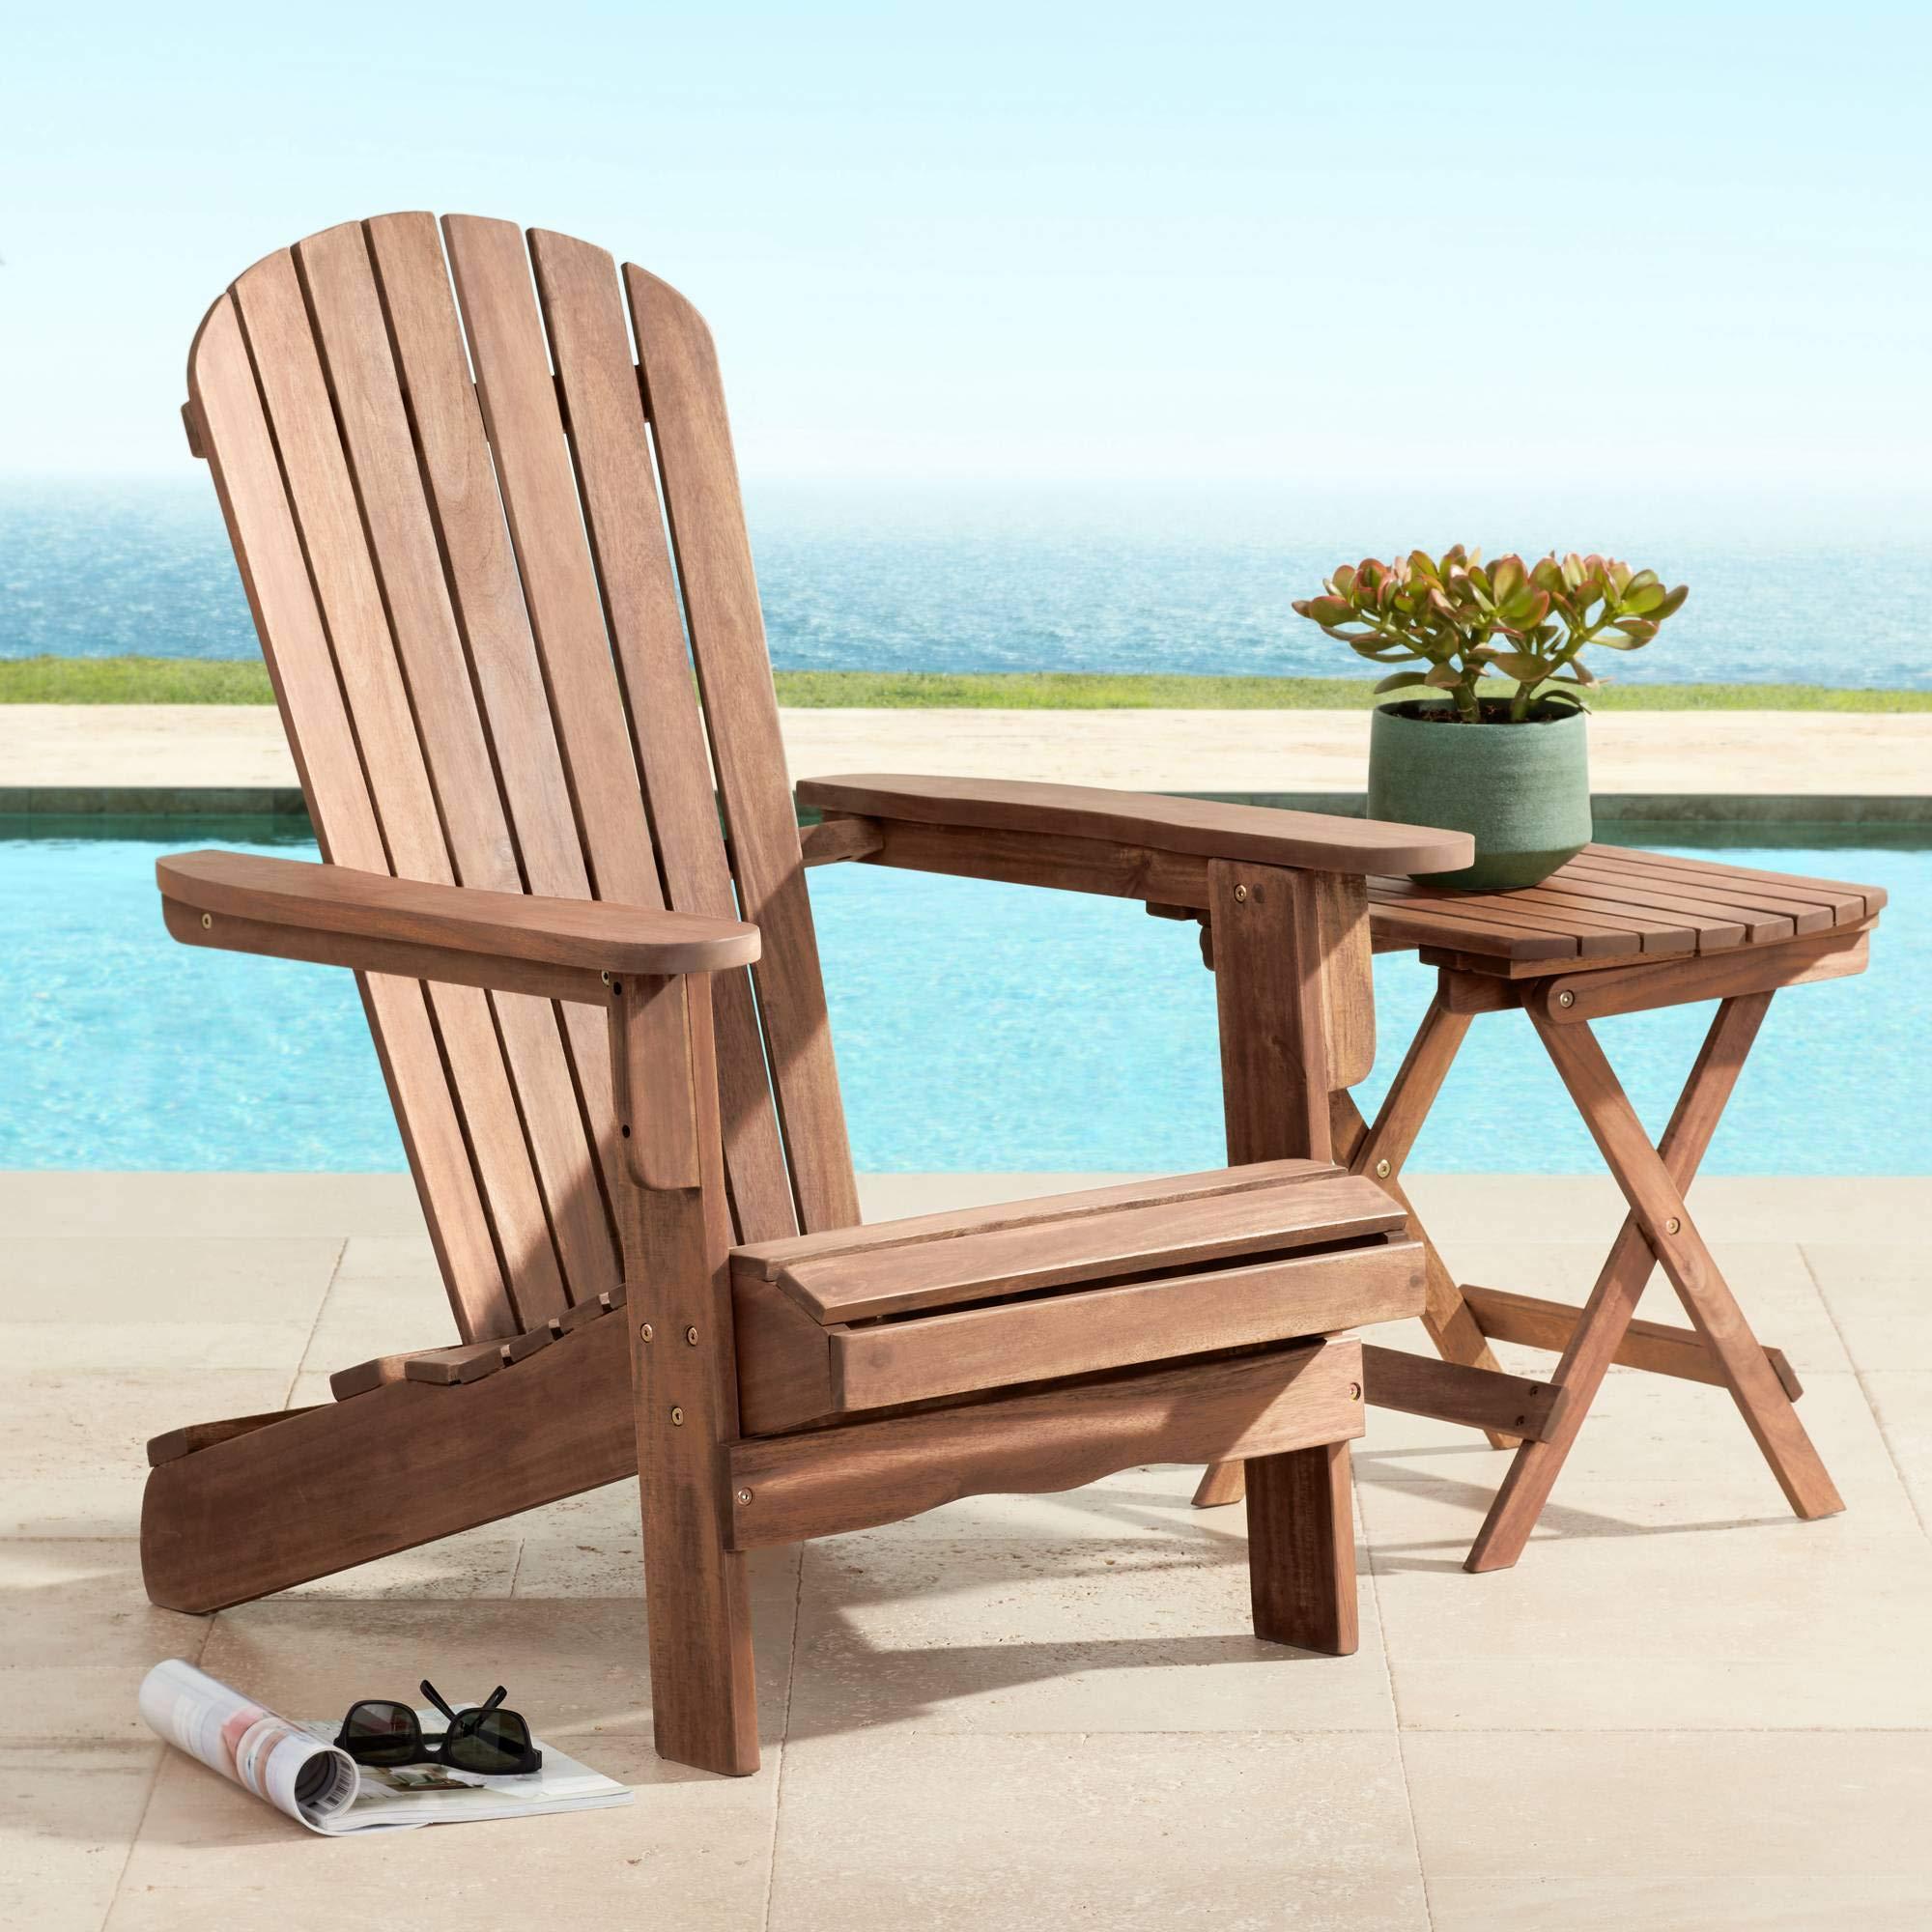 Wide Natural Wood Adirondack Chair